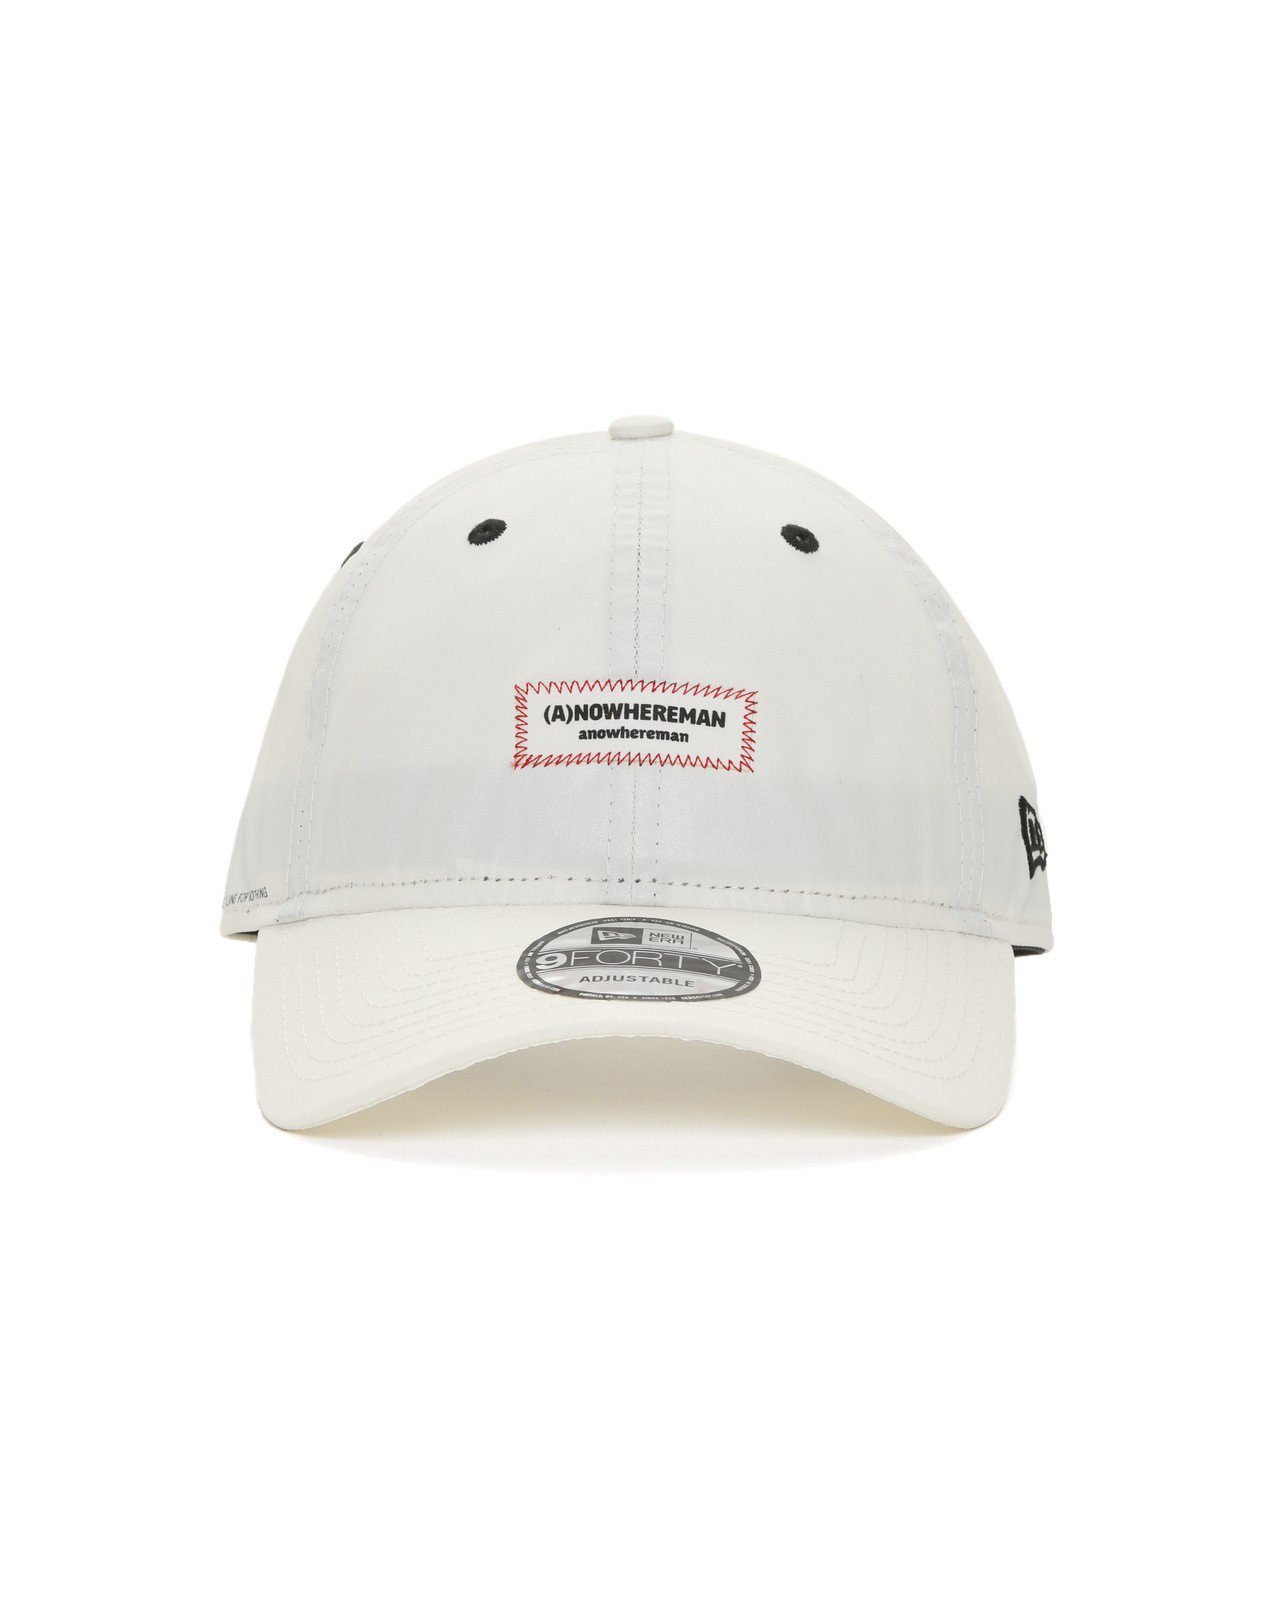 (A)NOWHEREMAN x NEW ERA聯名帽款,經典9FORTY老帽2,...